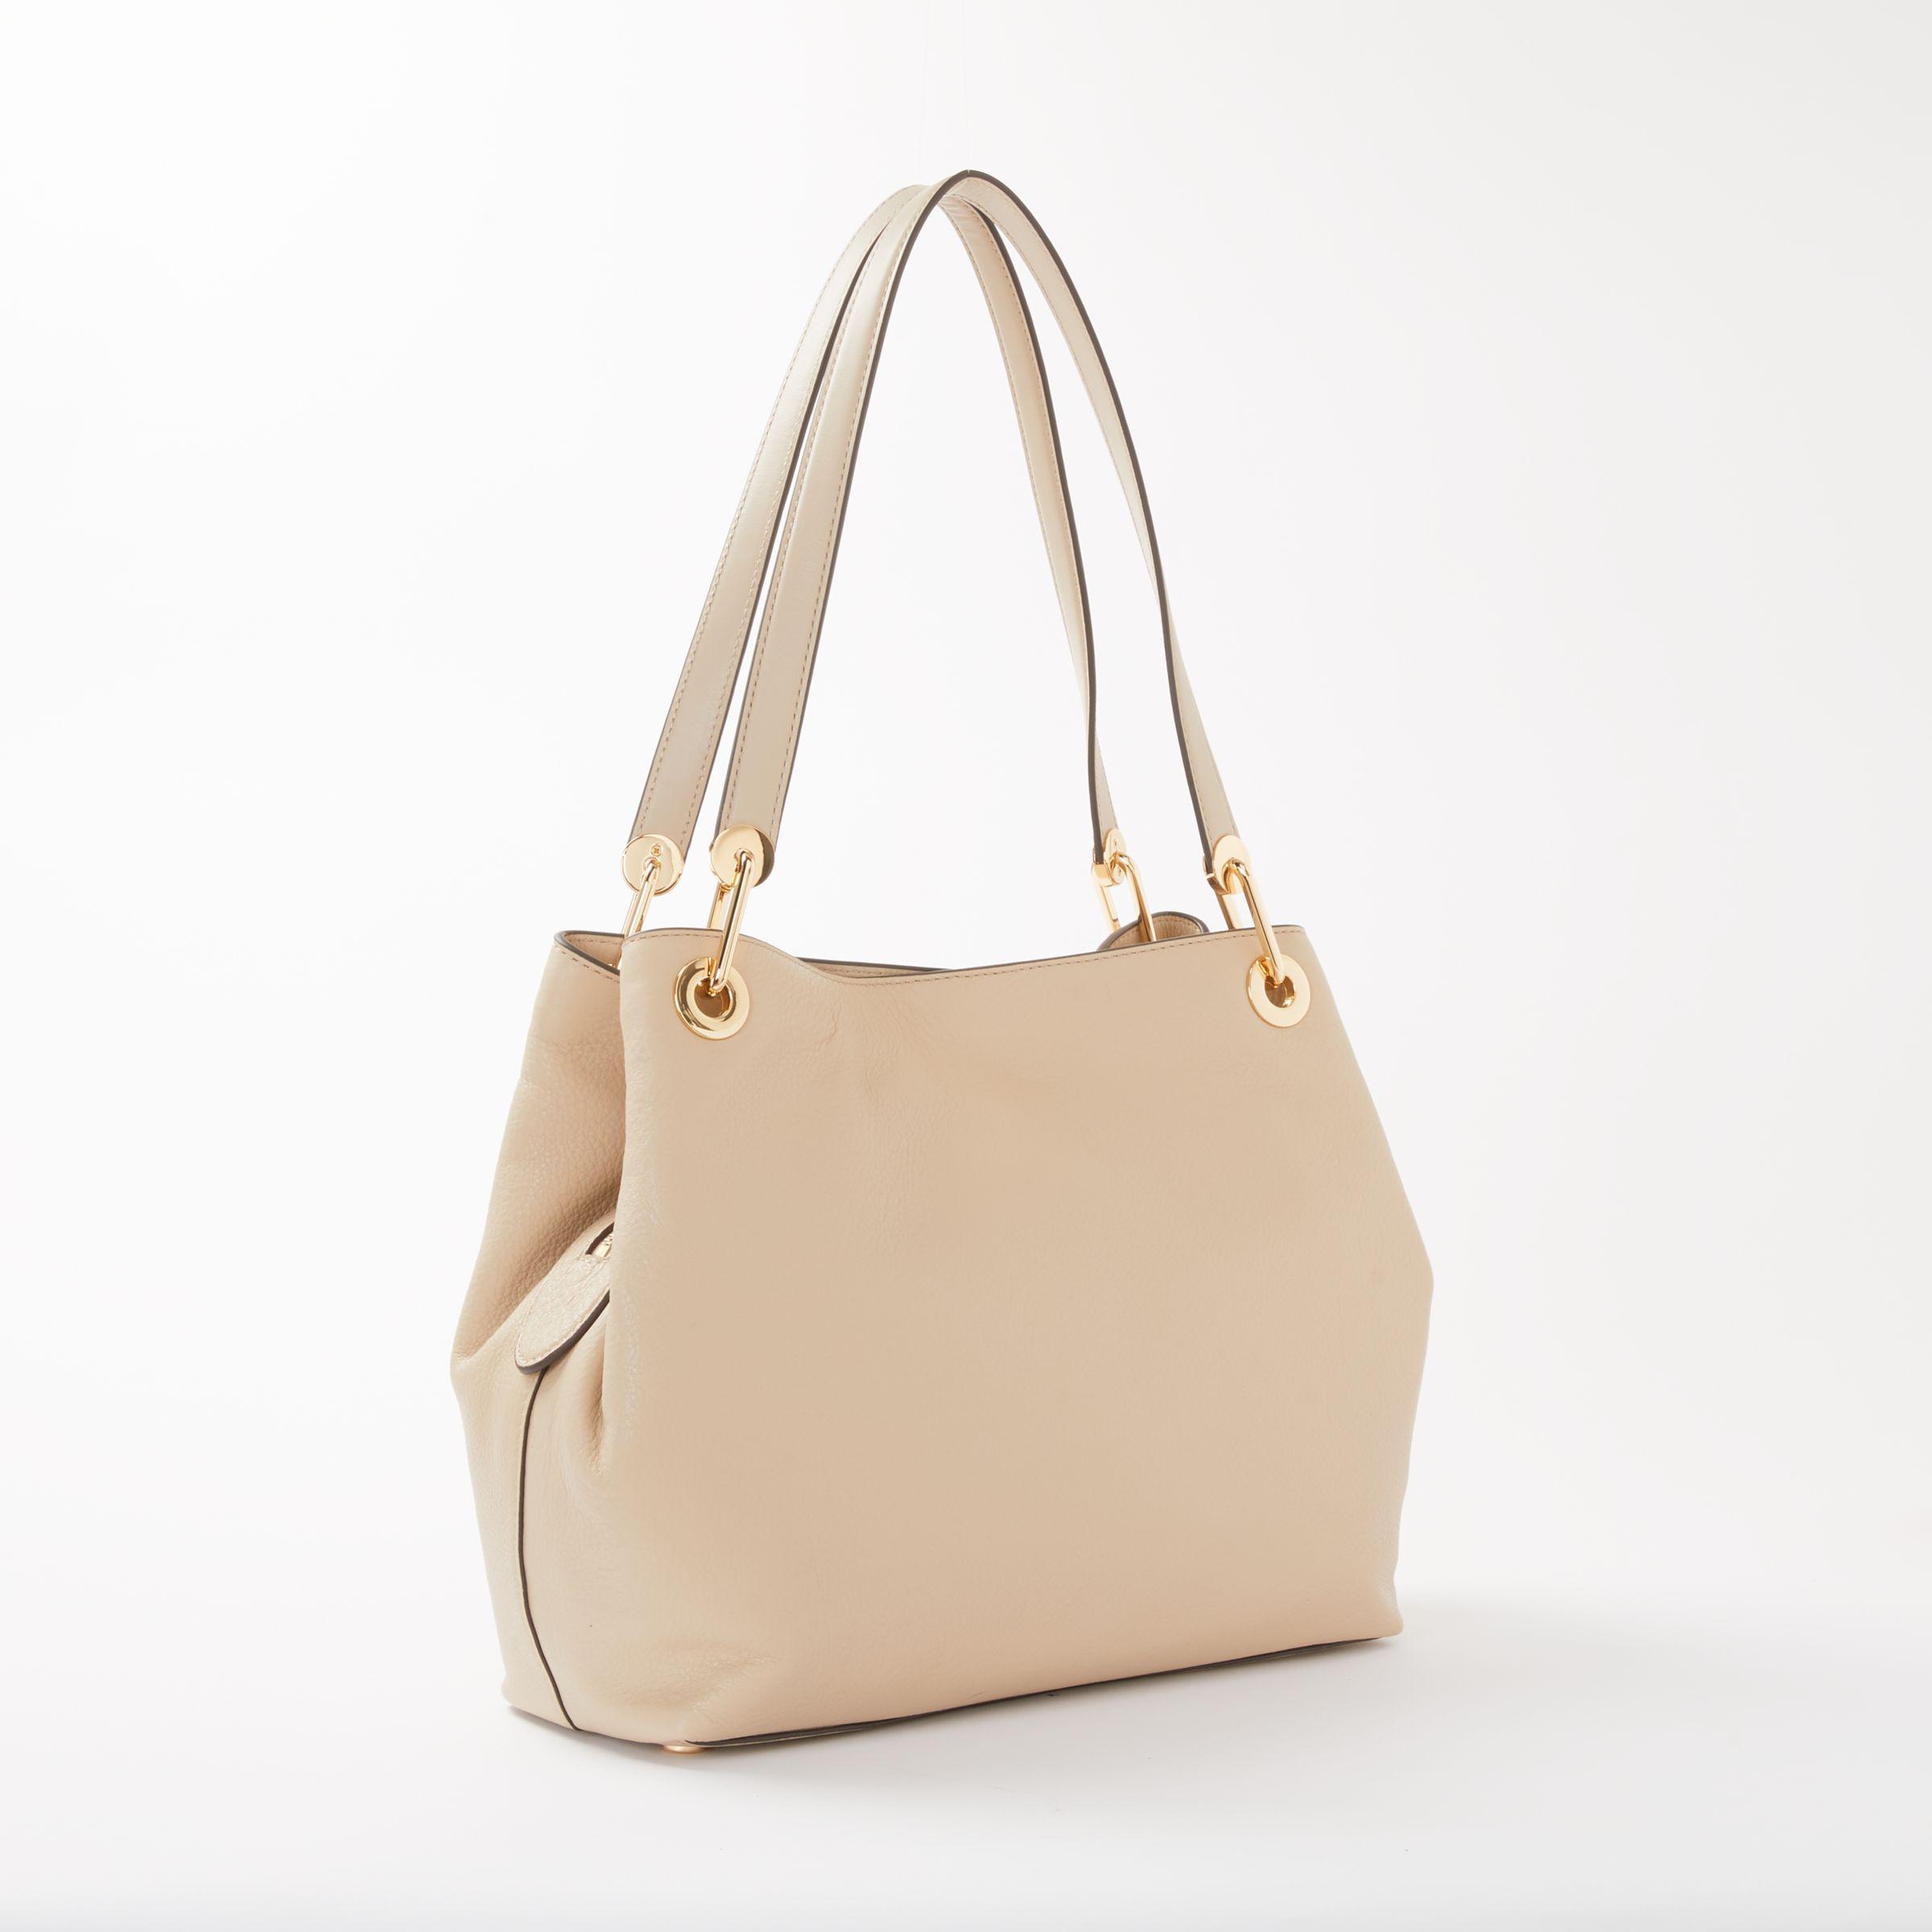 9054a6c0400b Michael Kors Michael Raven Leather Large Shoulder Bag in Natural - Lyst